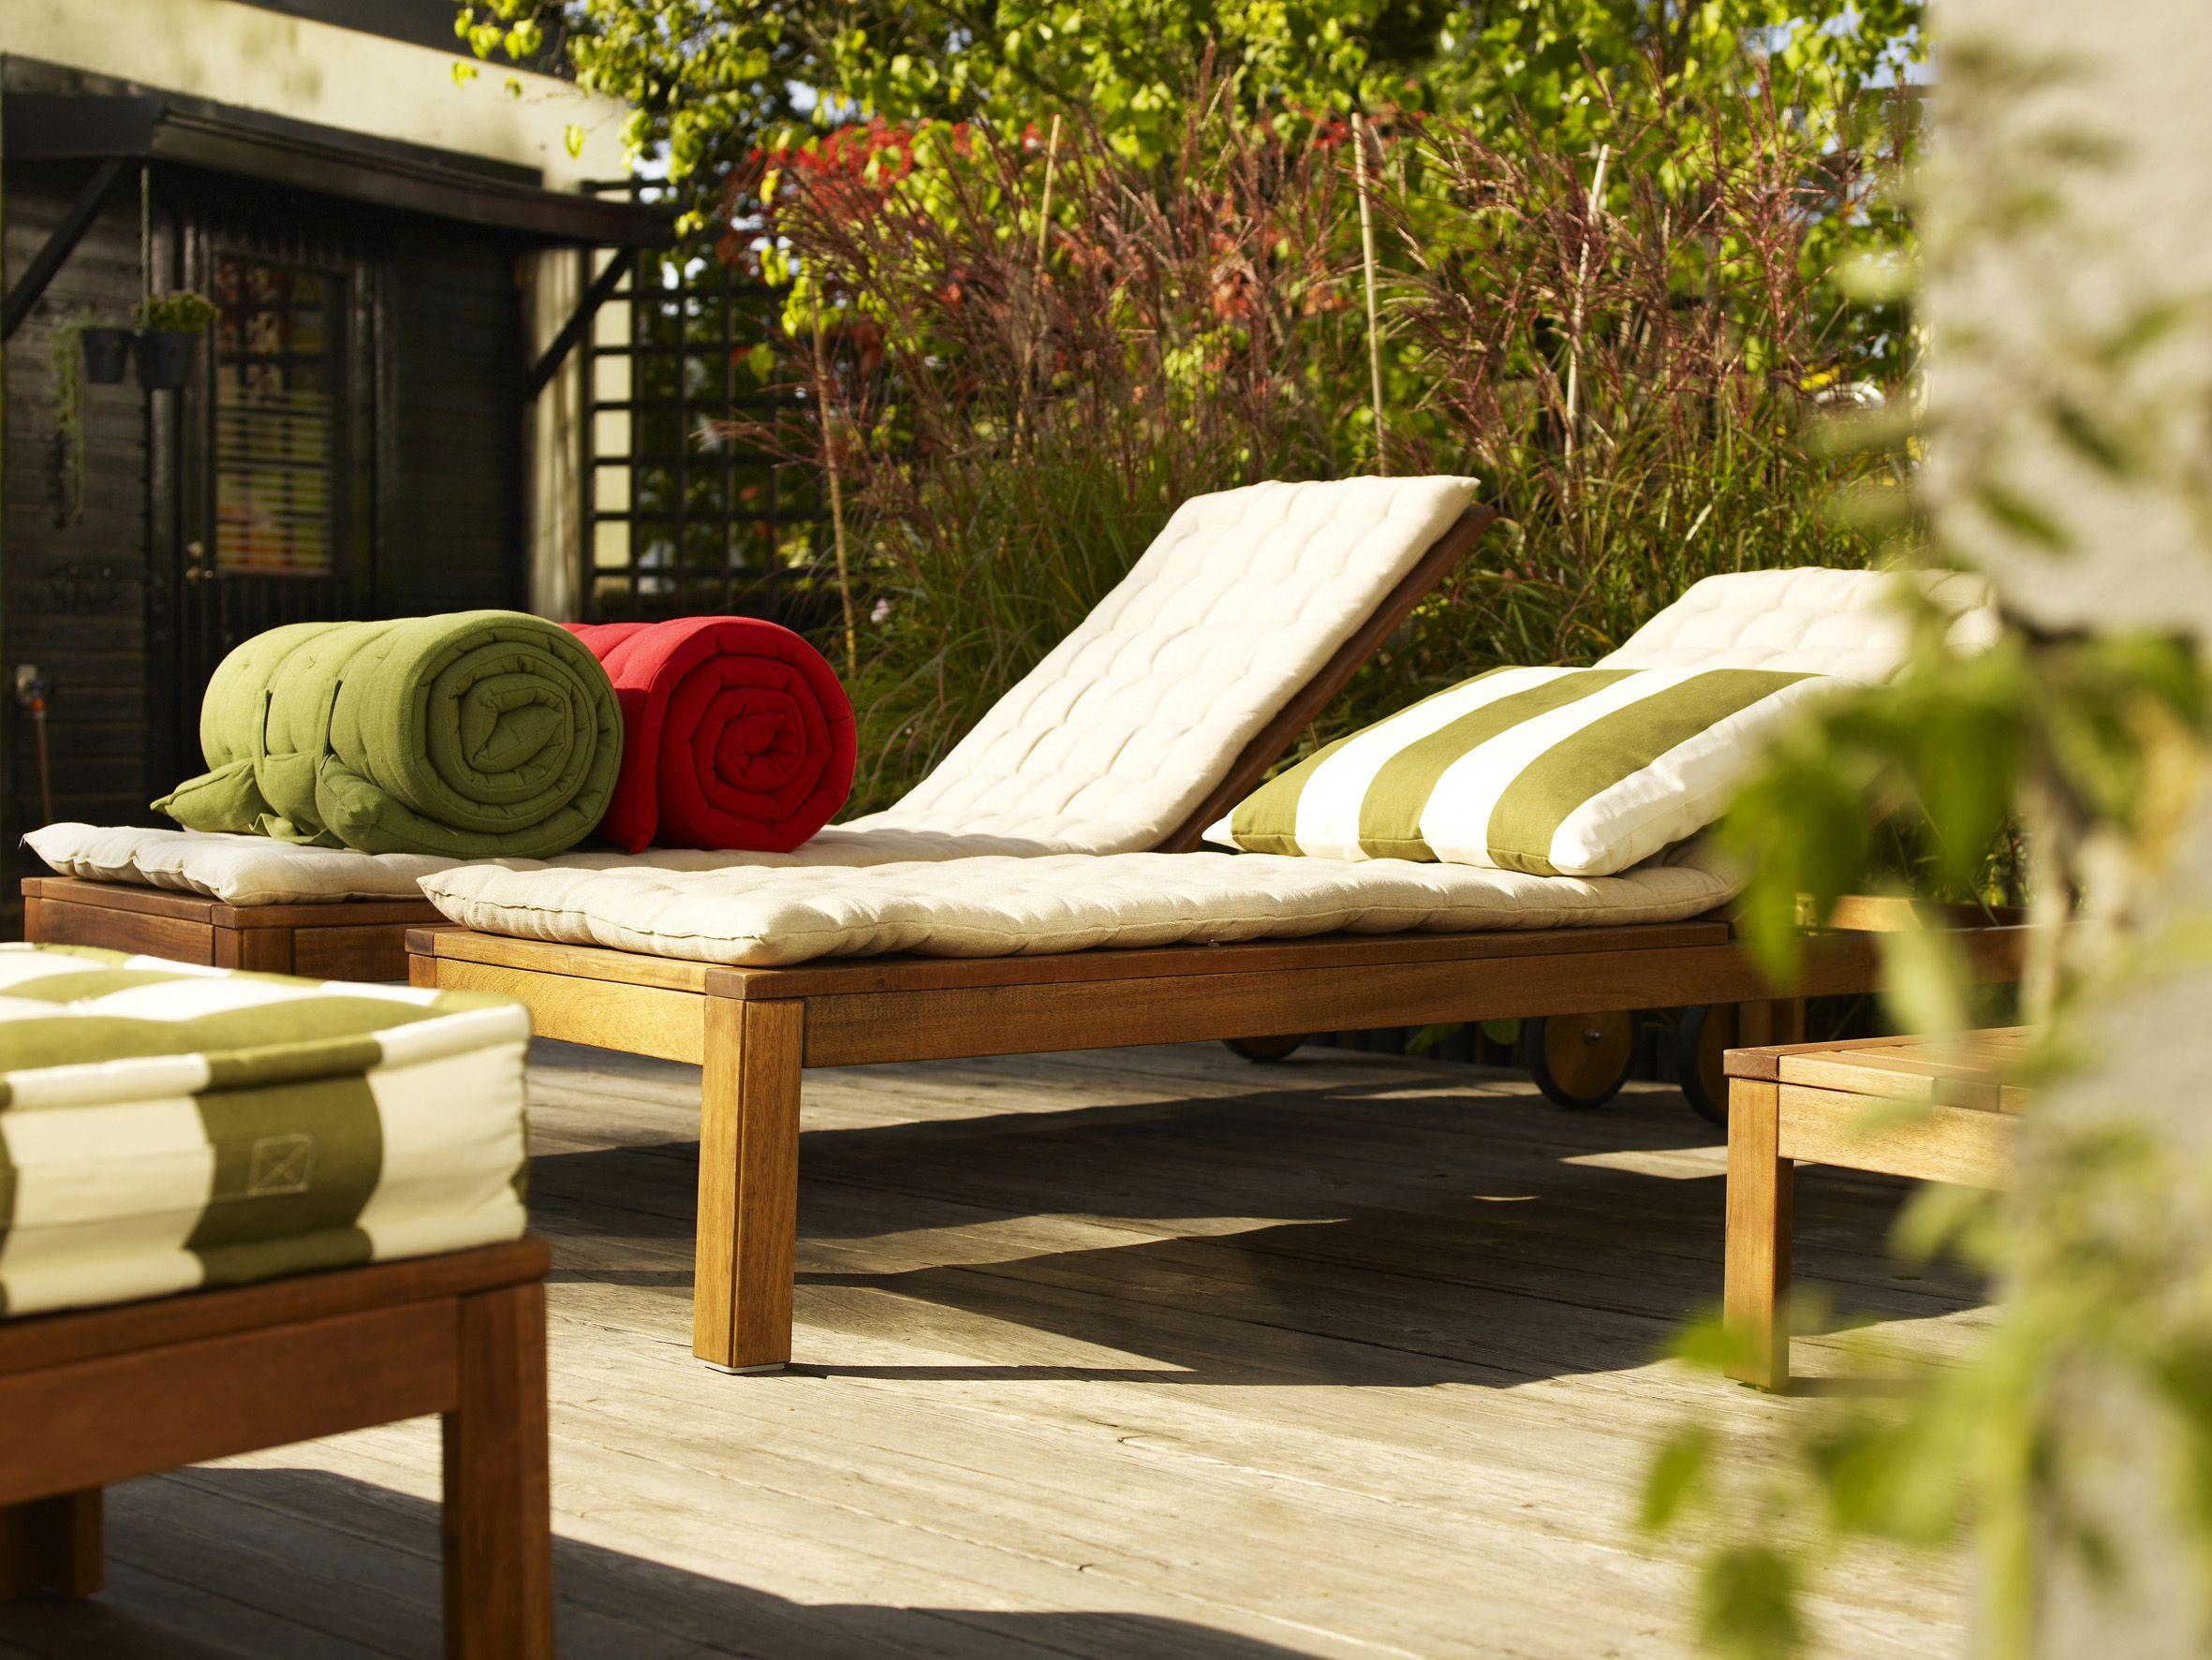 ikea pplar gartenliege garten m bel balkonm bel und garten. Black Bedroom Furniture Sets. Home Design Ideas